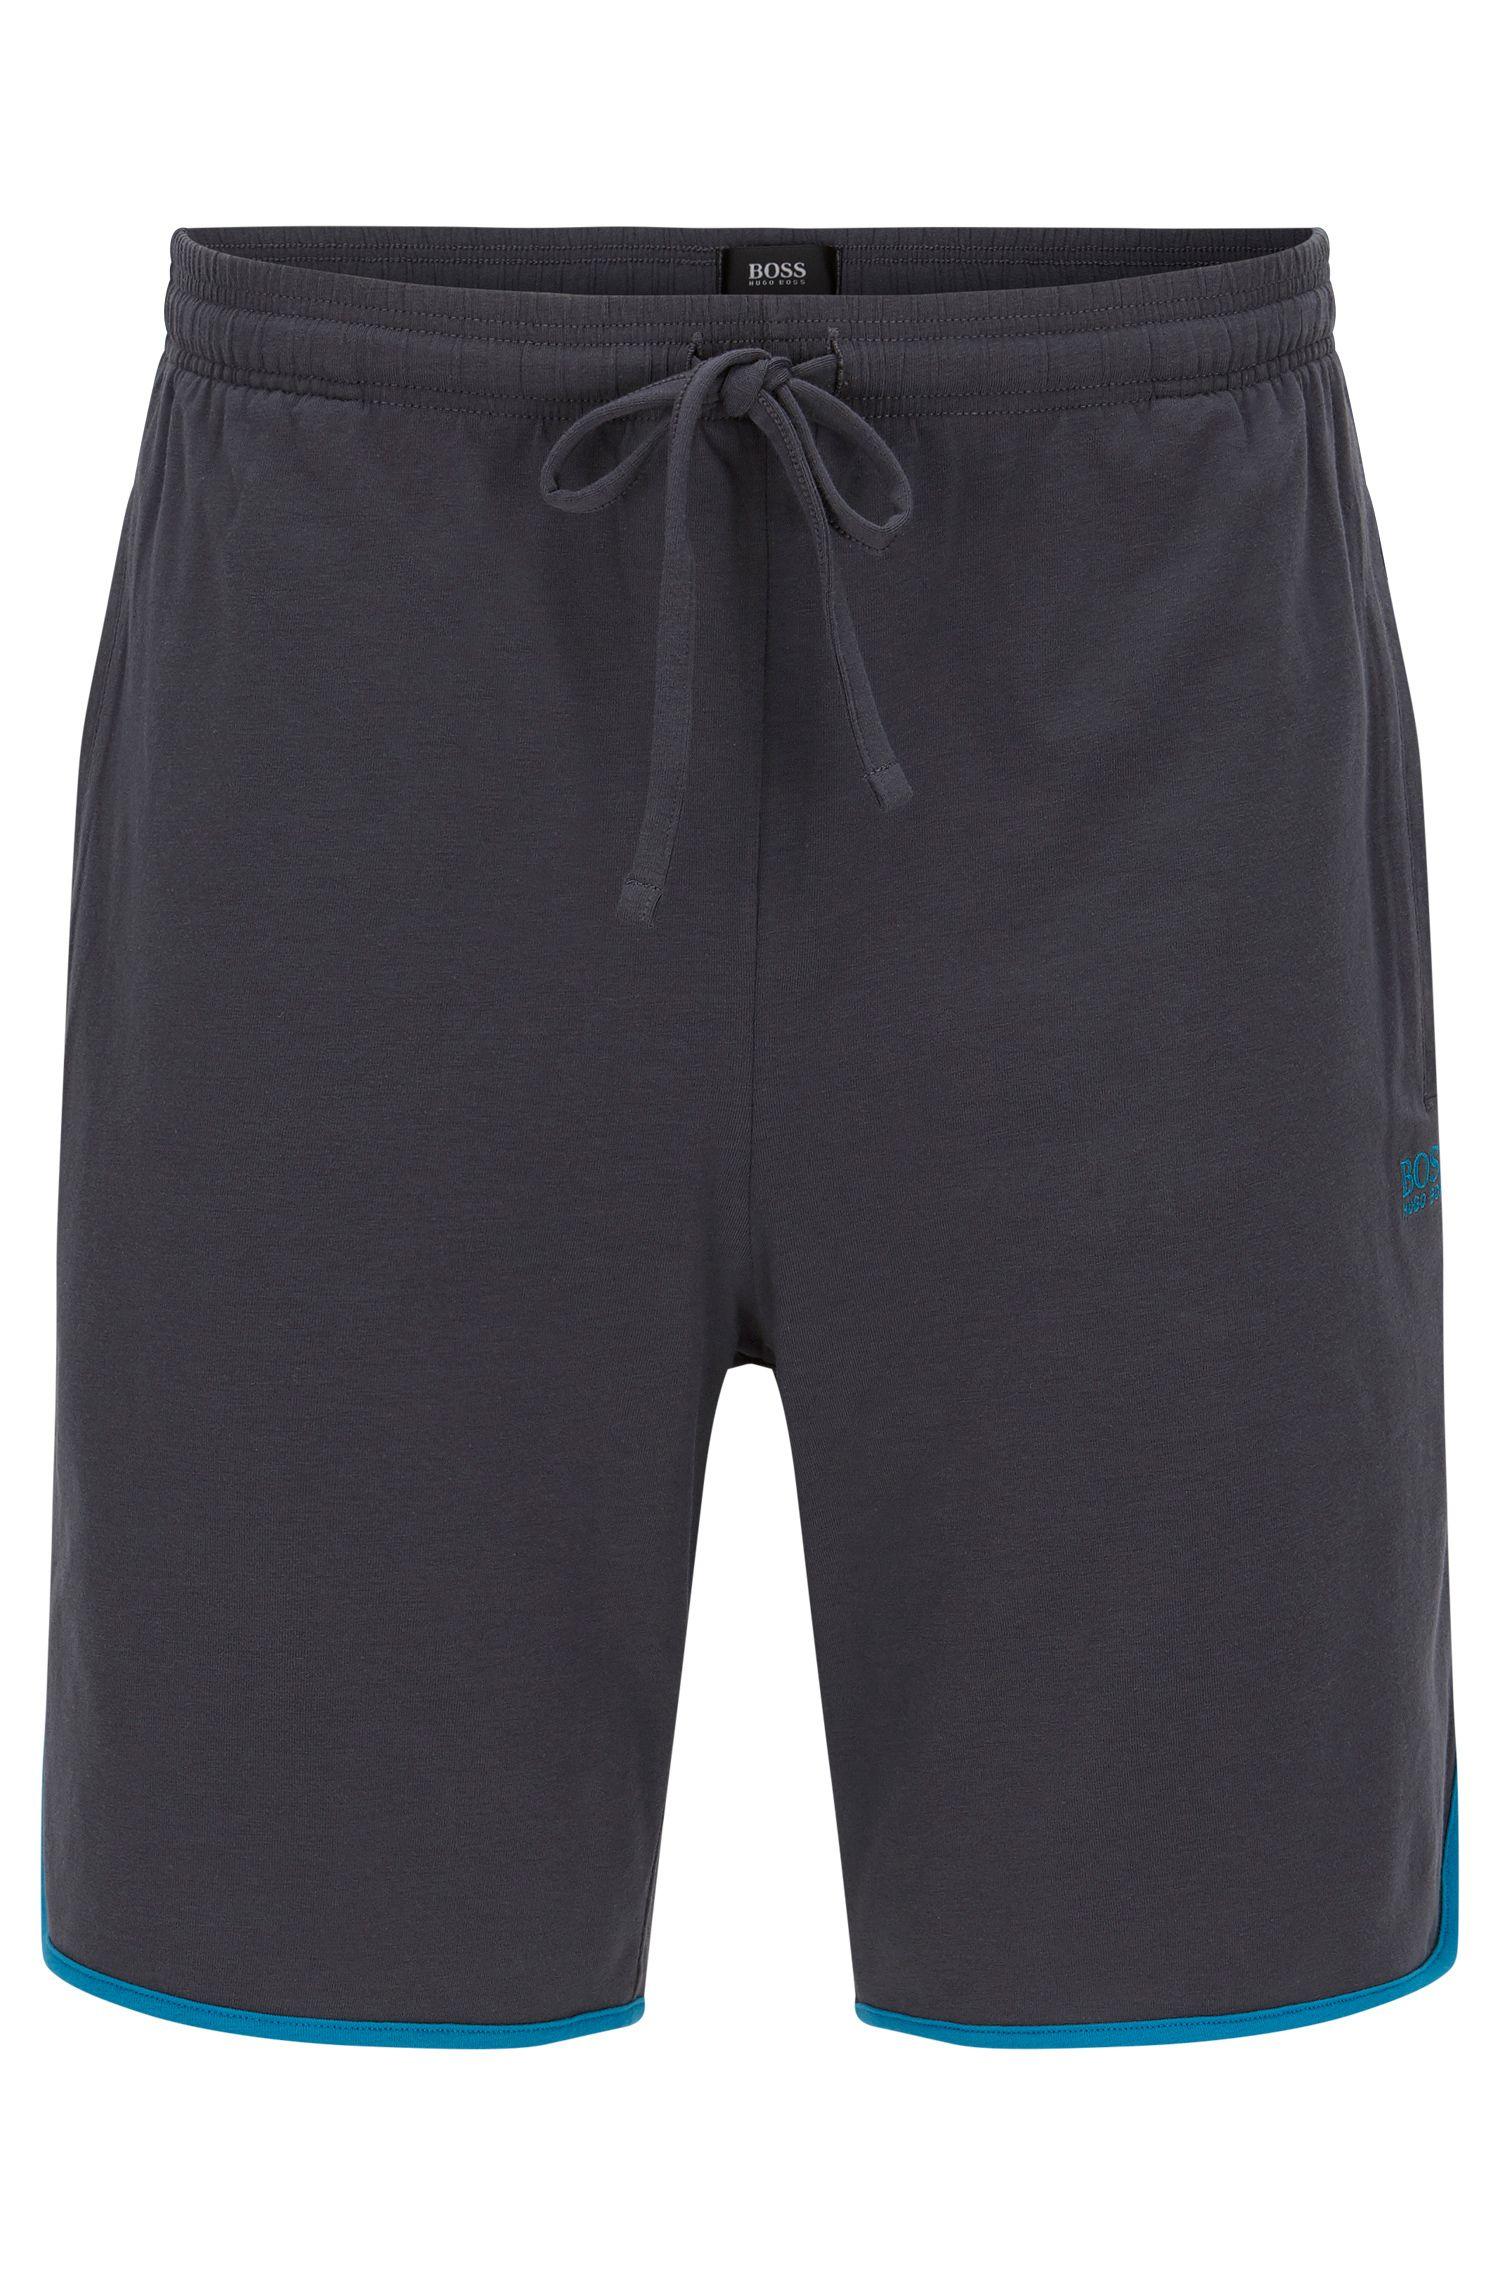 Kurze Pyjama-Hose aus Stretch-Baumwolle mit Kontrast-Paspeln